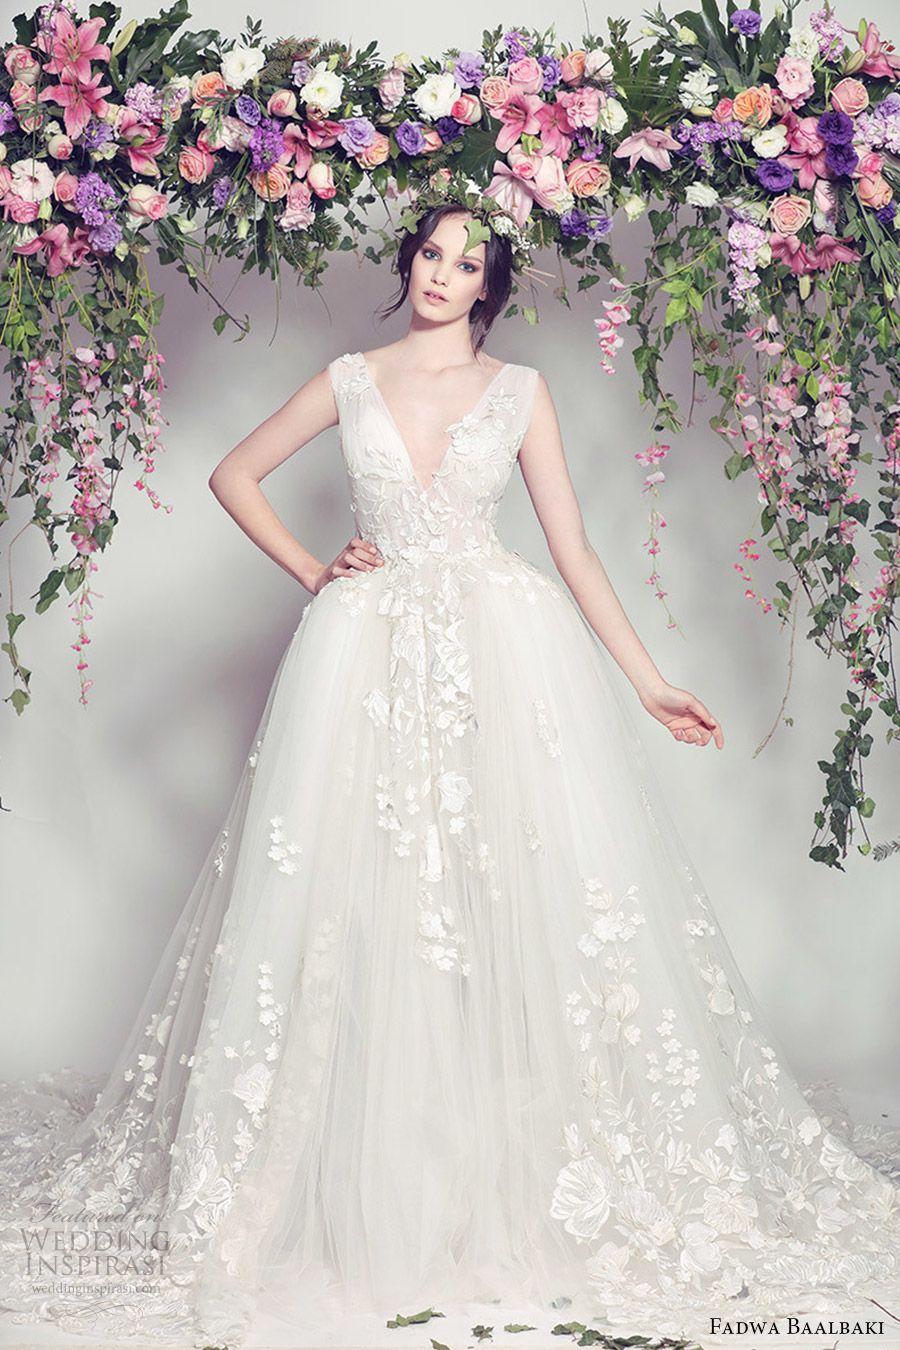 Fadwa Baalbaki Spring Summer 2016 Fleur Bleue Couture Collection Dress StylesBall Gown WeddingWedding